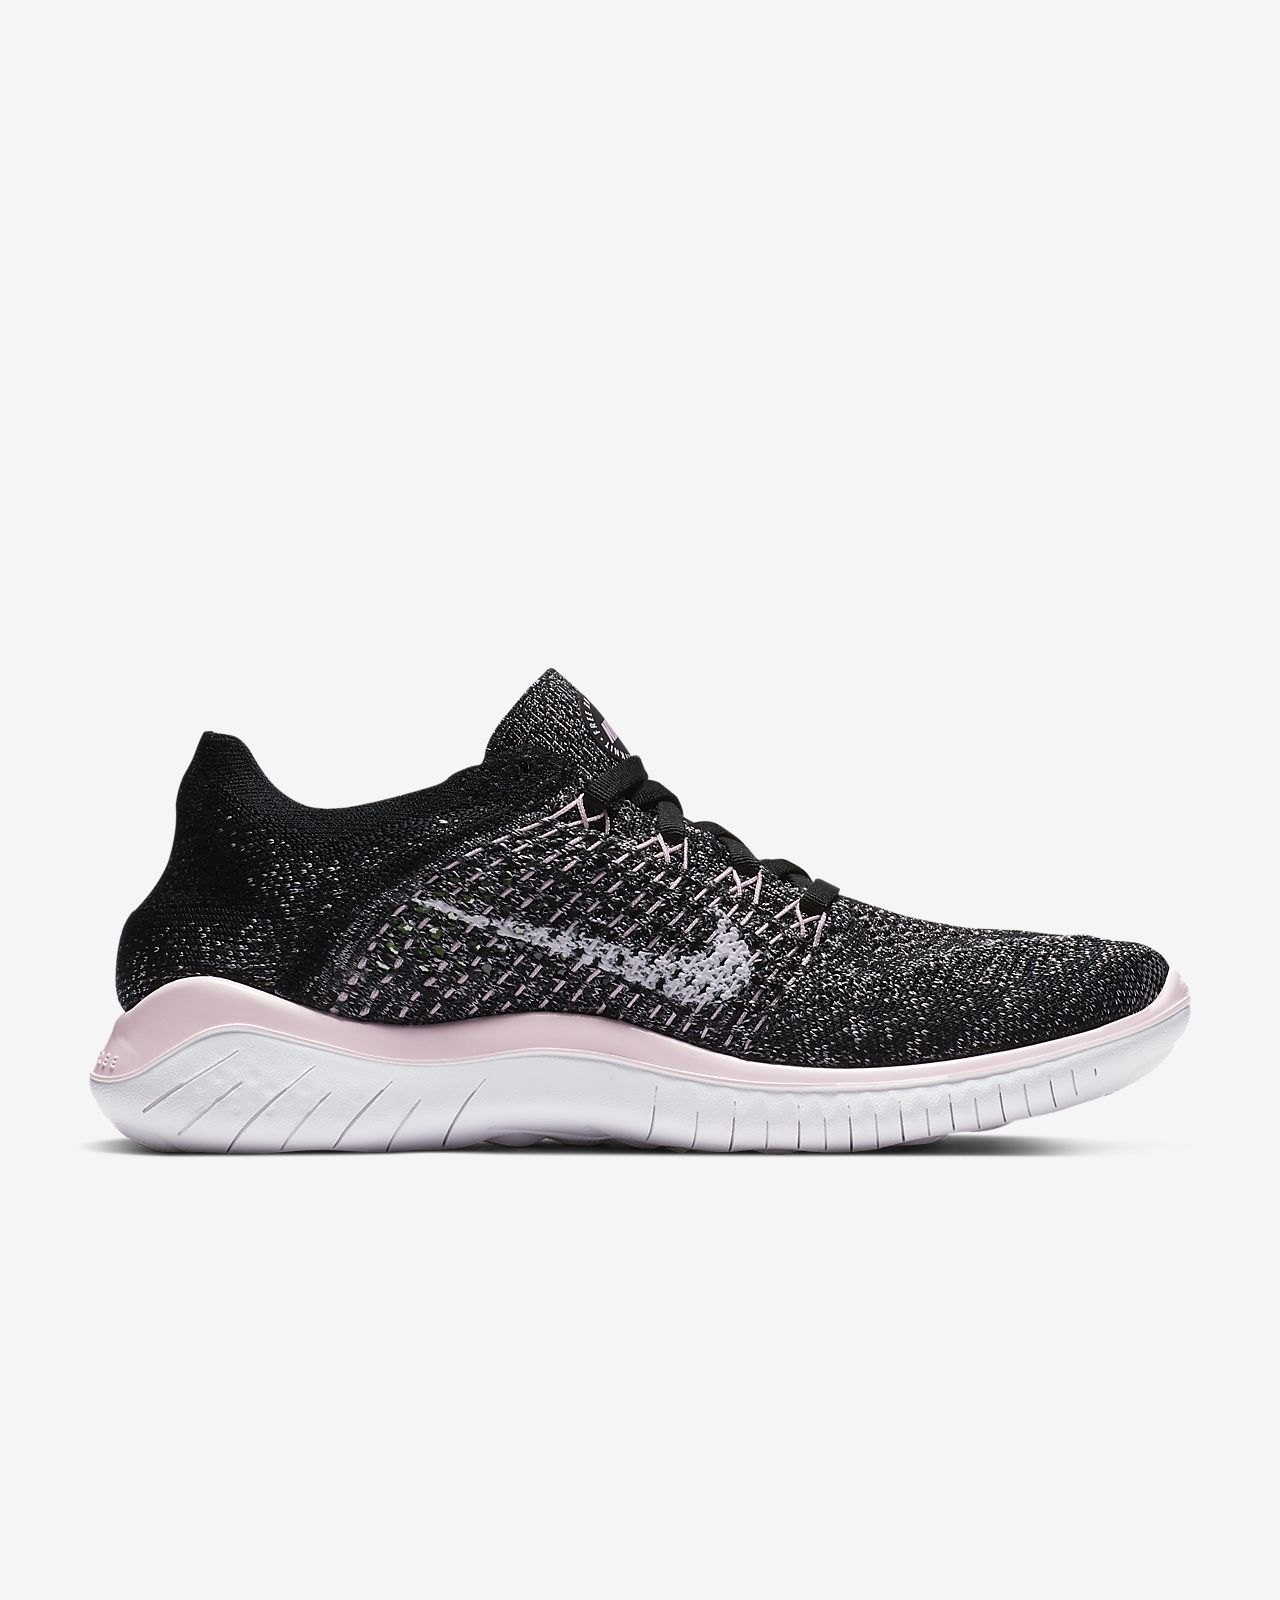 designer fashion 20c3b e0fe3 Nike Free RN Flyknit 2018 Women's Running Shoe